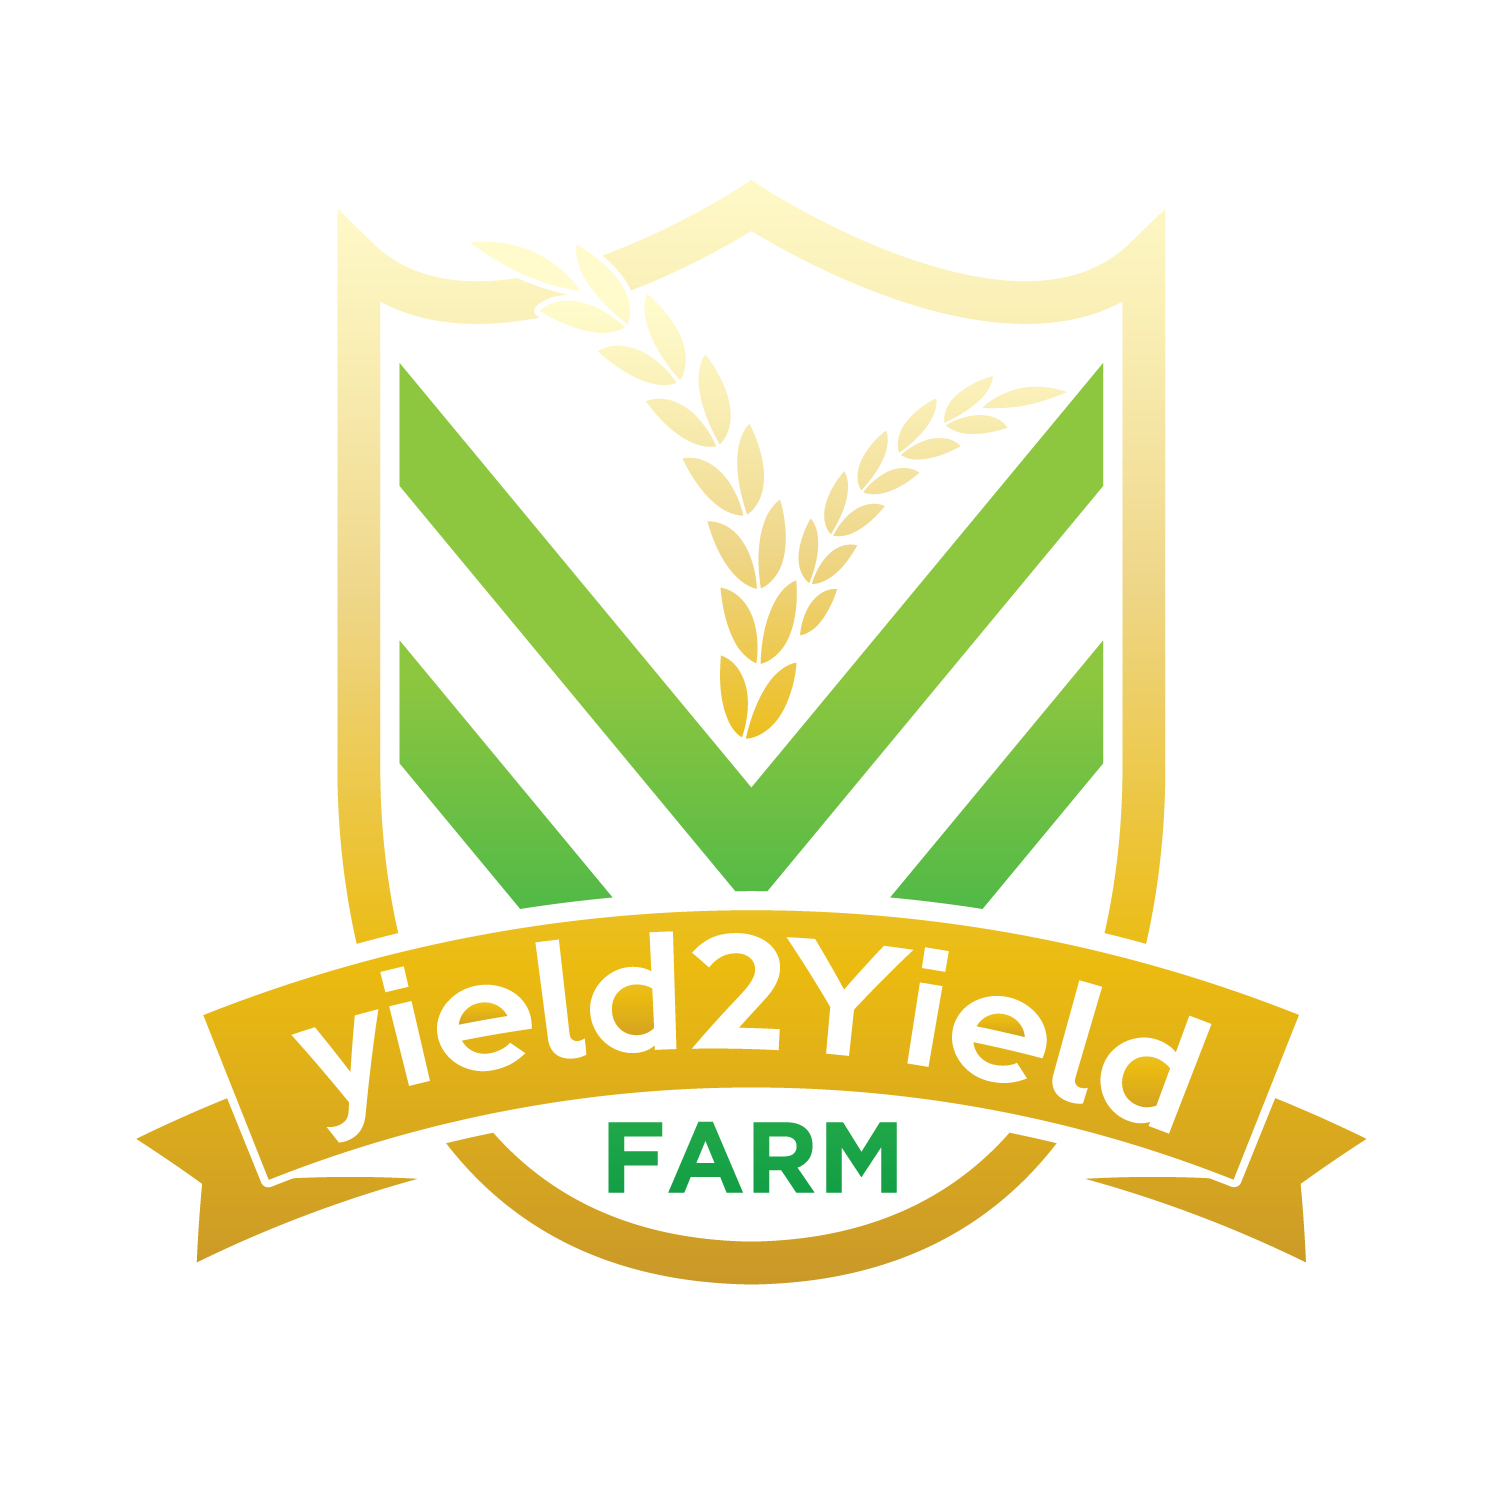 yield2Yield